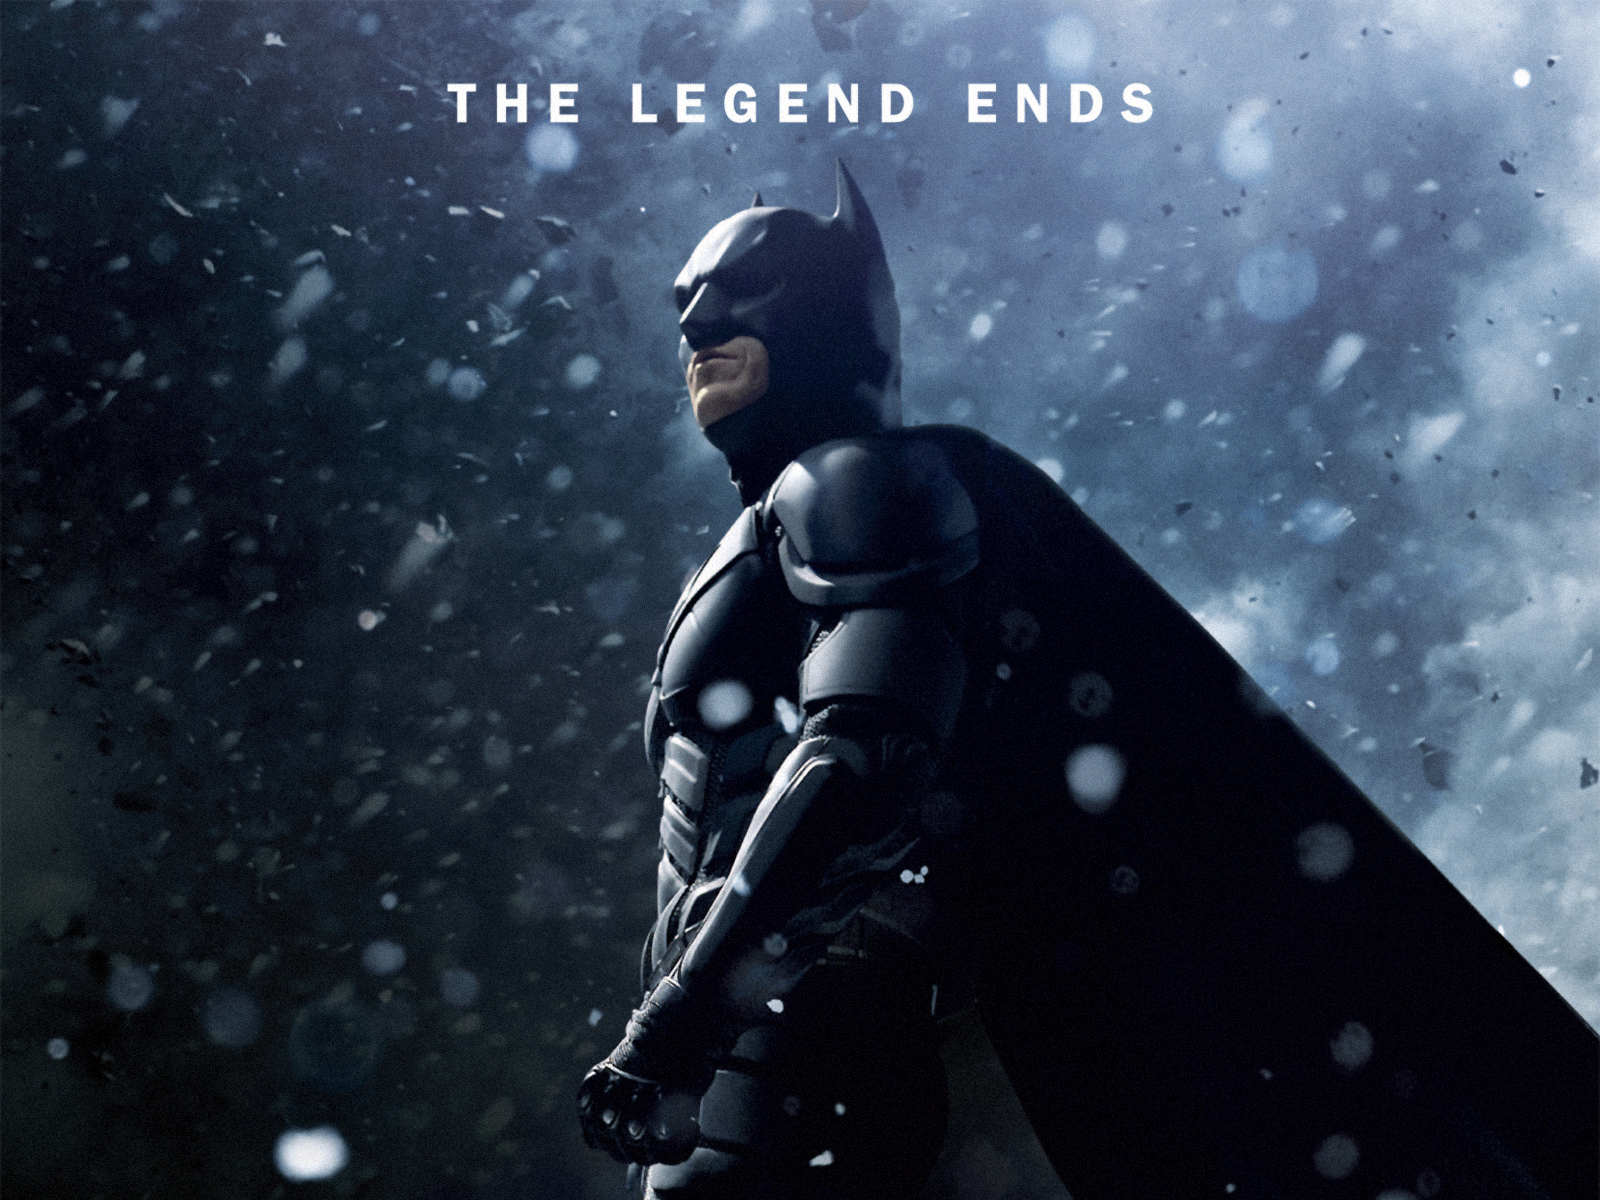 The Dark Knight Risea